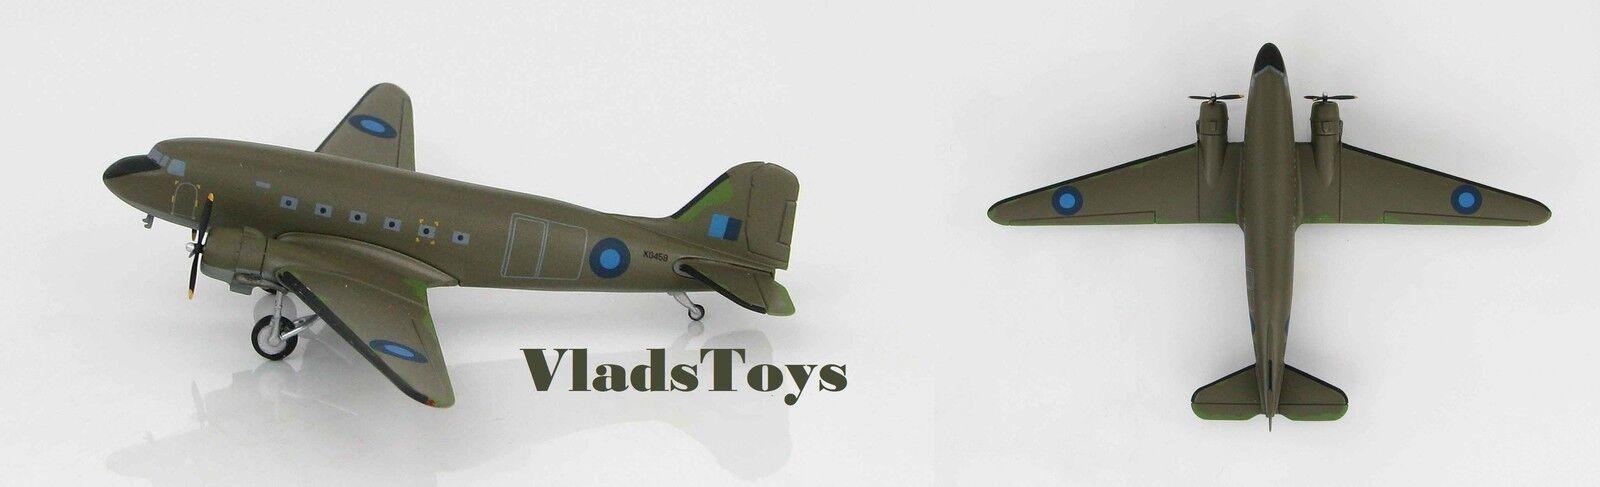 Hobby Master 1 200 C-47 Skytrain Raf No.194 Sqn,KG459,Birmania,Marzo 1944 HL1311